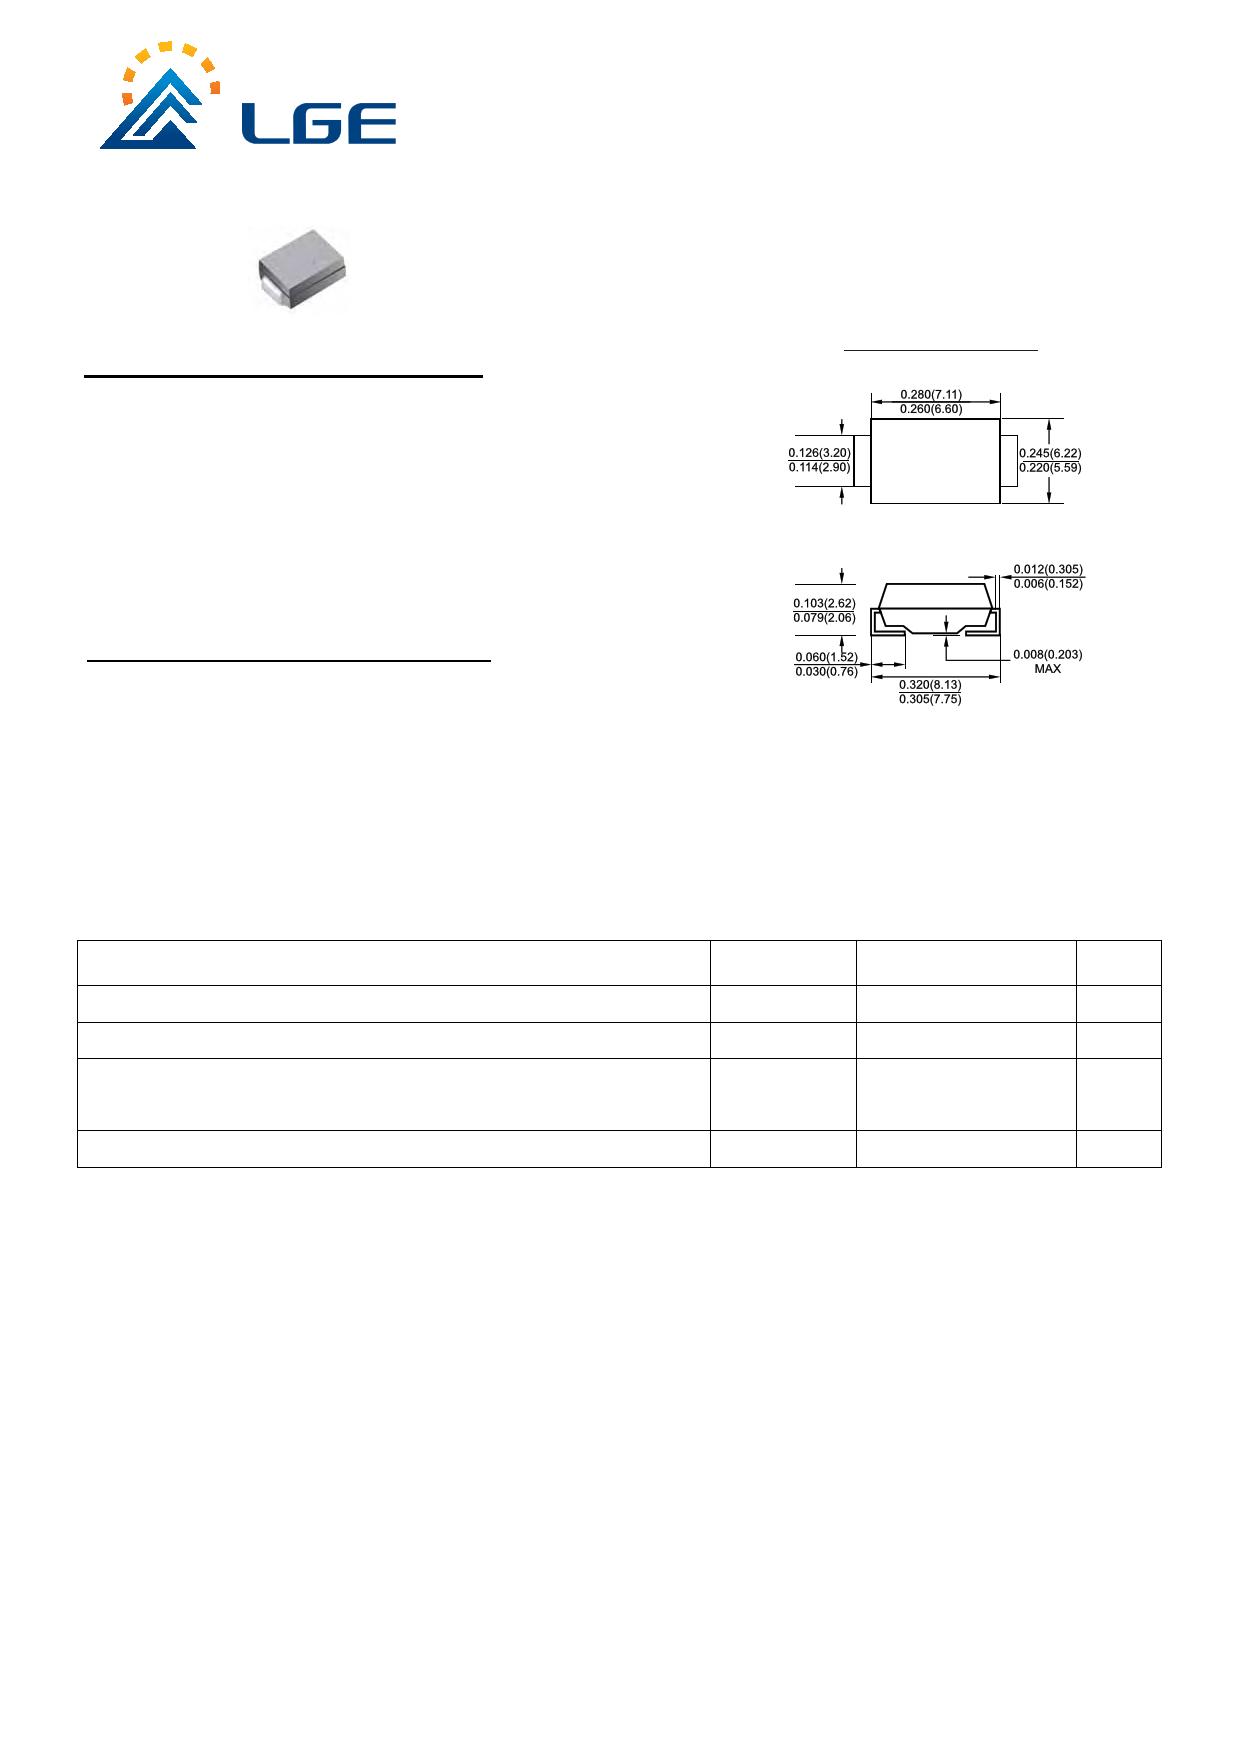 3.0SMCJ200CA Datasheet, 3.0SMCJ200CA PDF,ピン配置, 機能